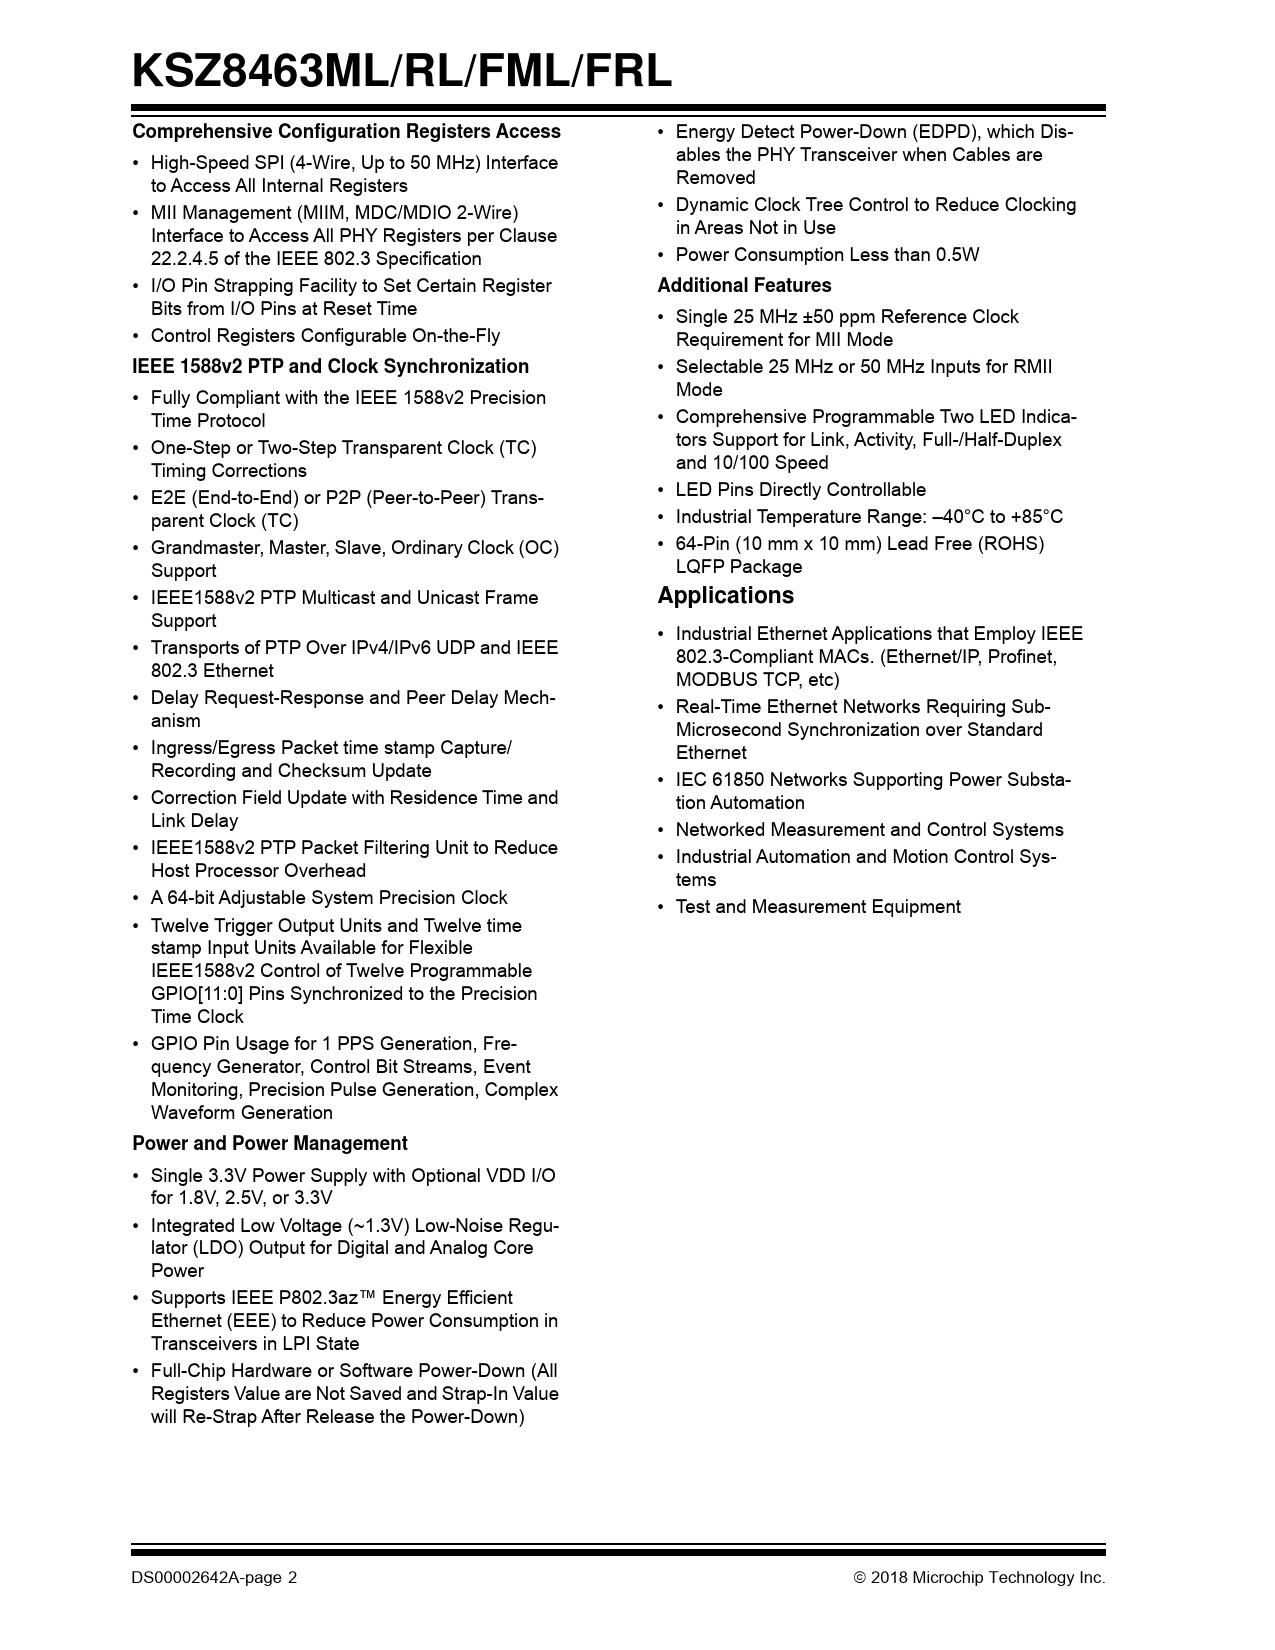 KSZ8463ML/RL/FML/FRL Comprehensive Configuration Registers Access Additional Features